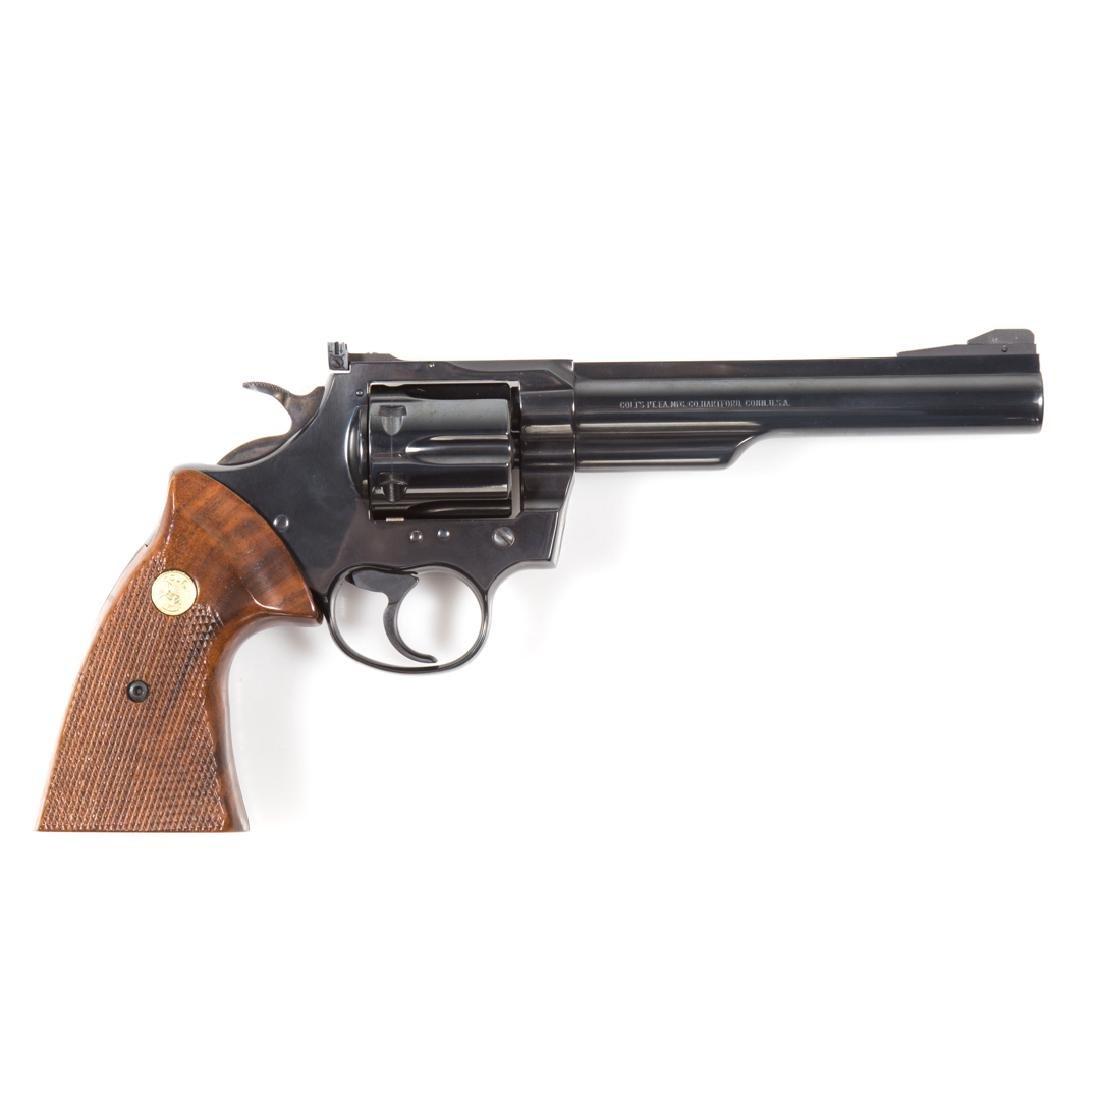 Colt Trooper MK III 357 magnum revolver